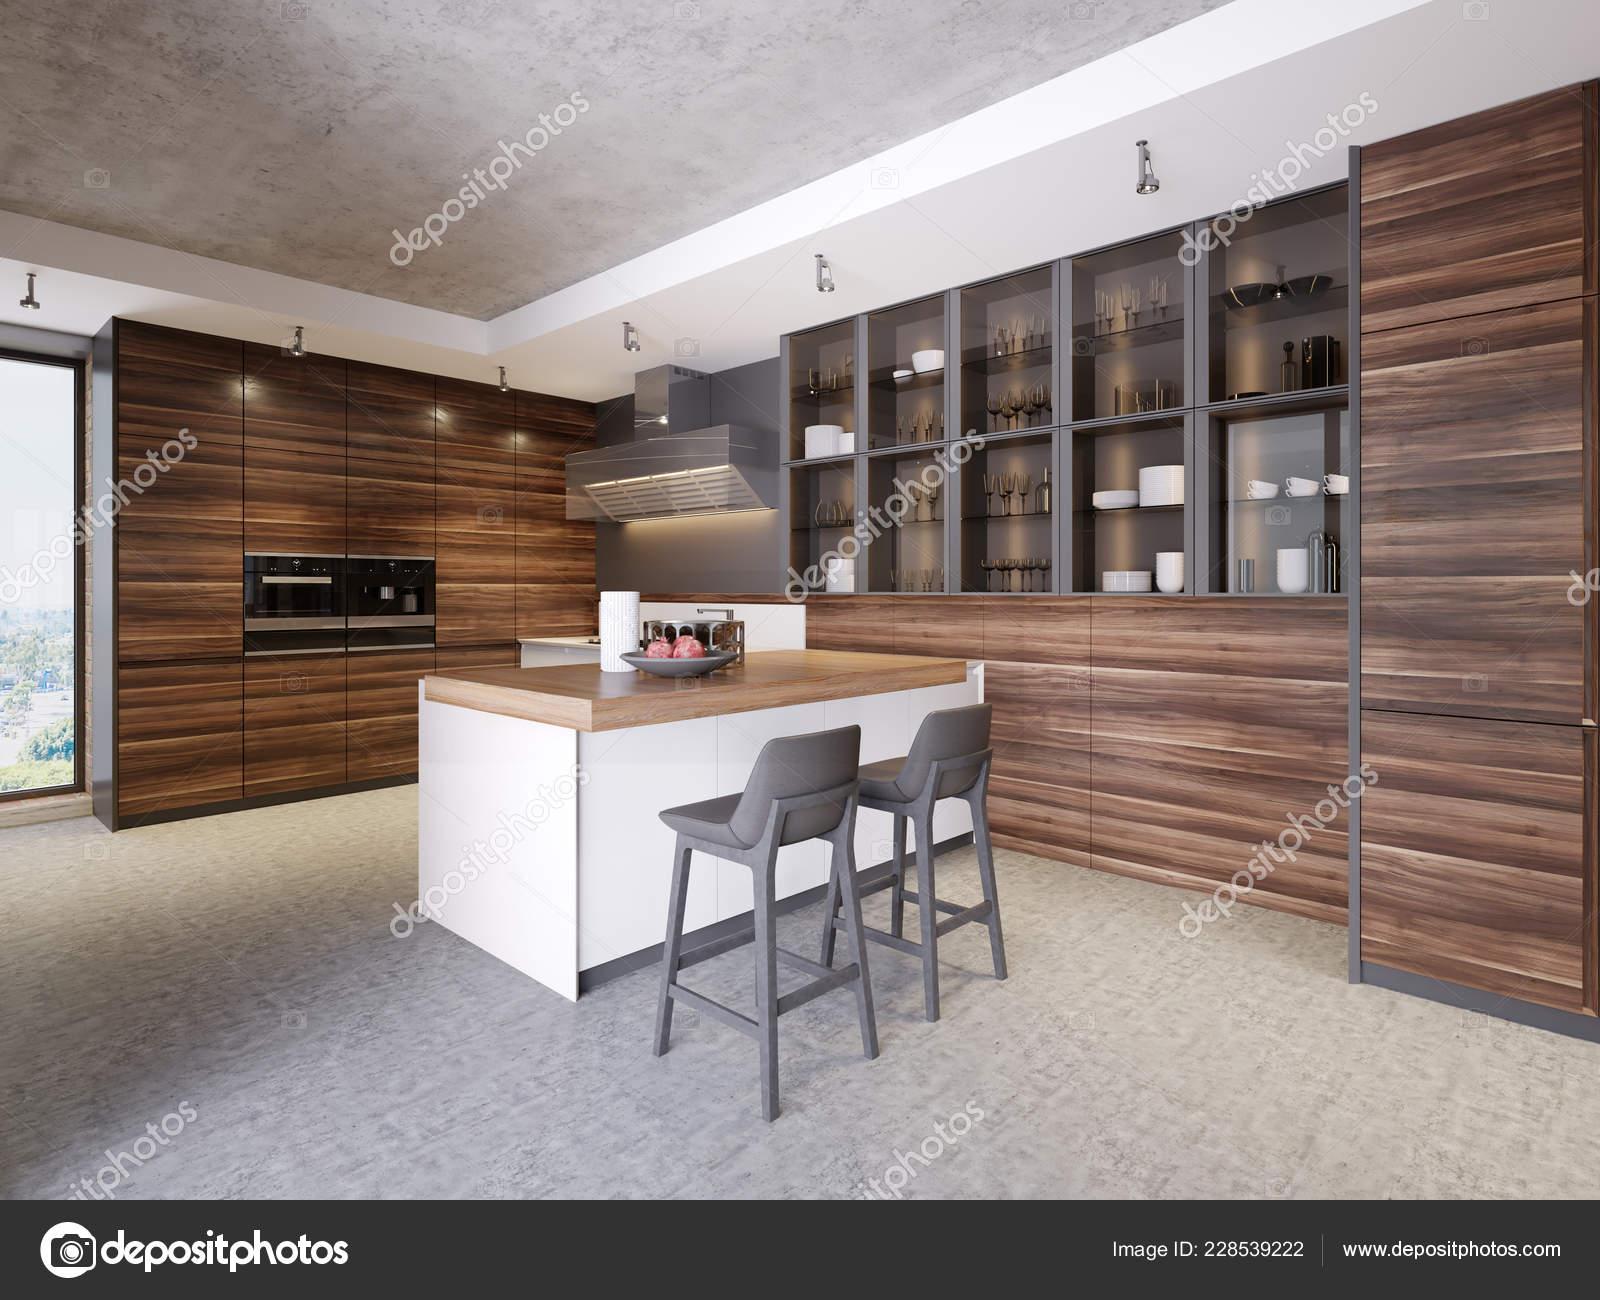 Interior Cocina Diseño Moderno Estilo Contemporáneo Con Aparatos ...